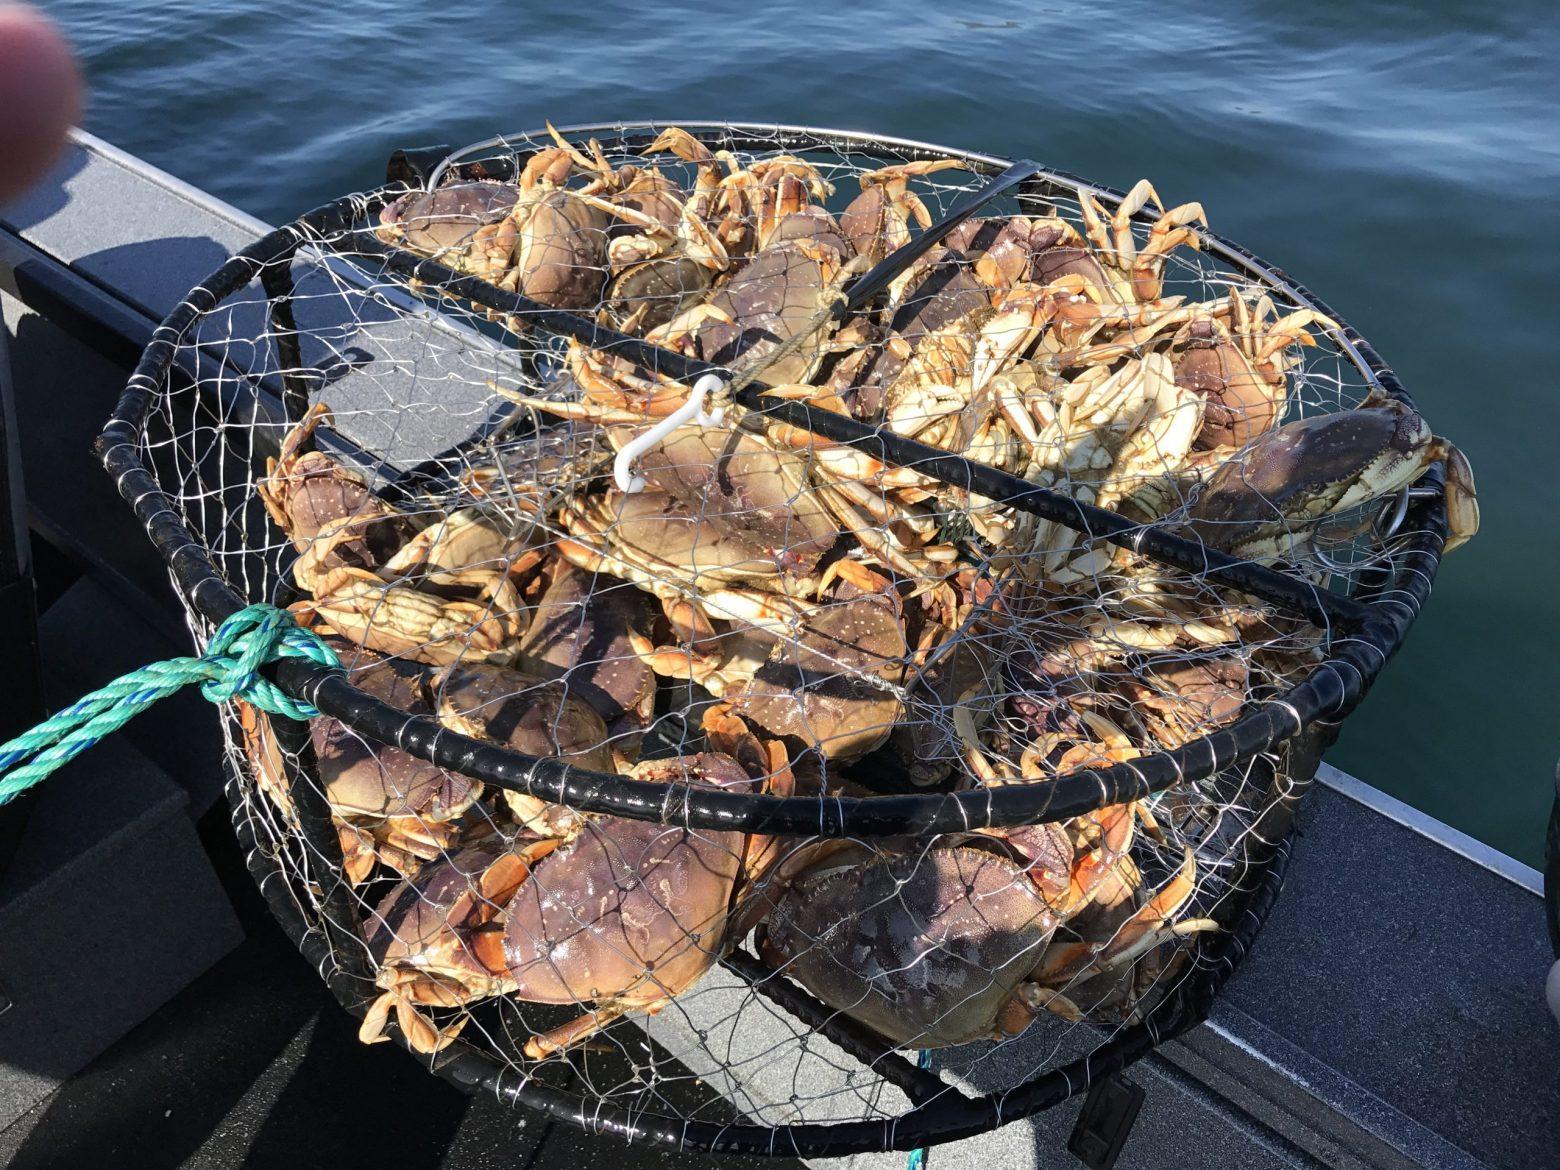 Columbia River Fishing (Crabbing) Report November 28th, 2019